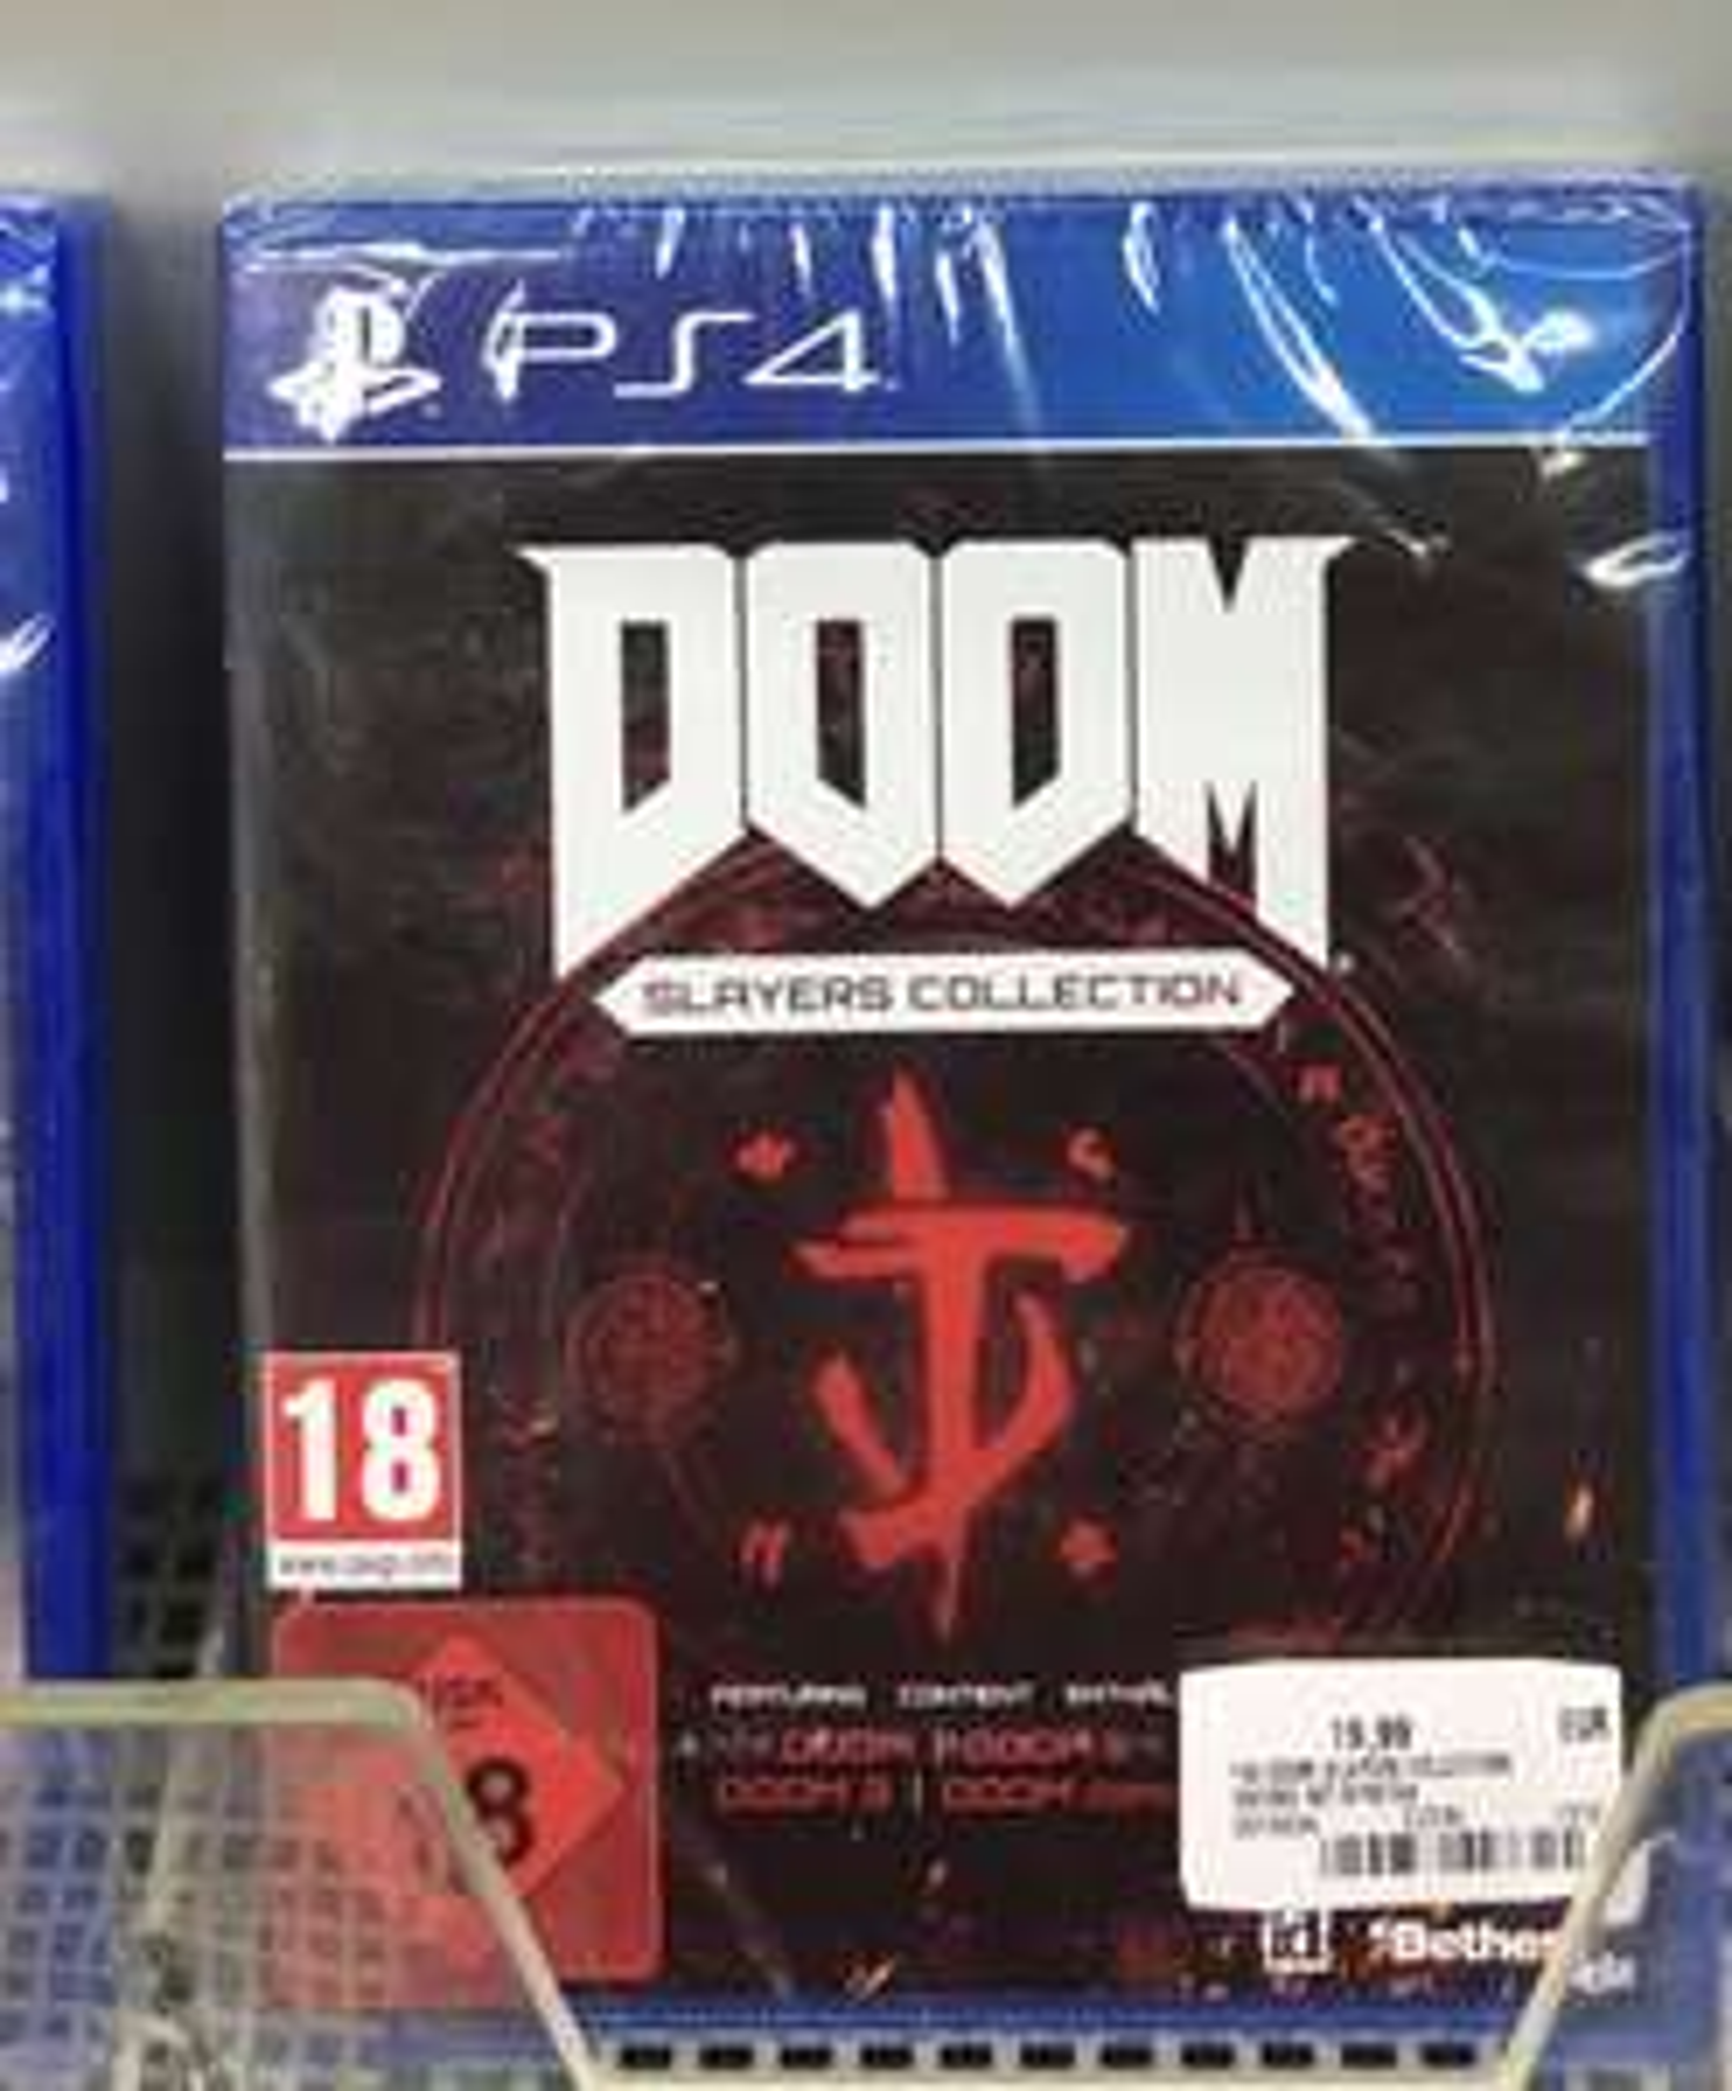 [LOKAL] Media Markt Leipzig P.C. Doom Slayers Collection - PS4